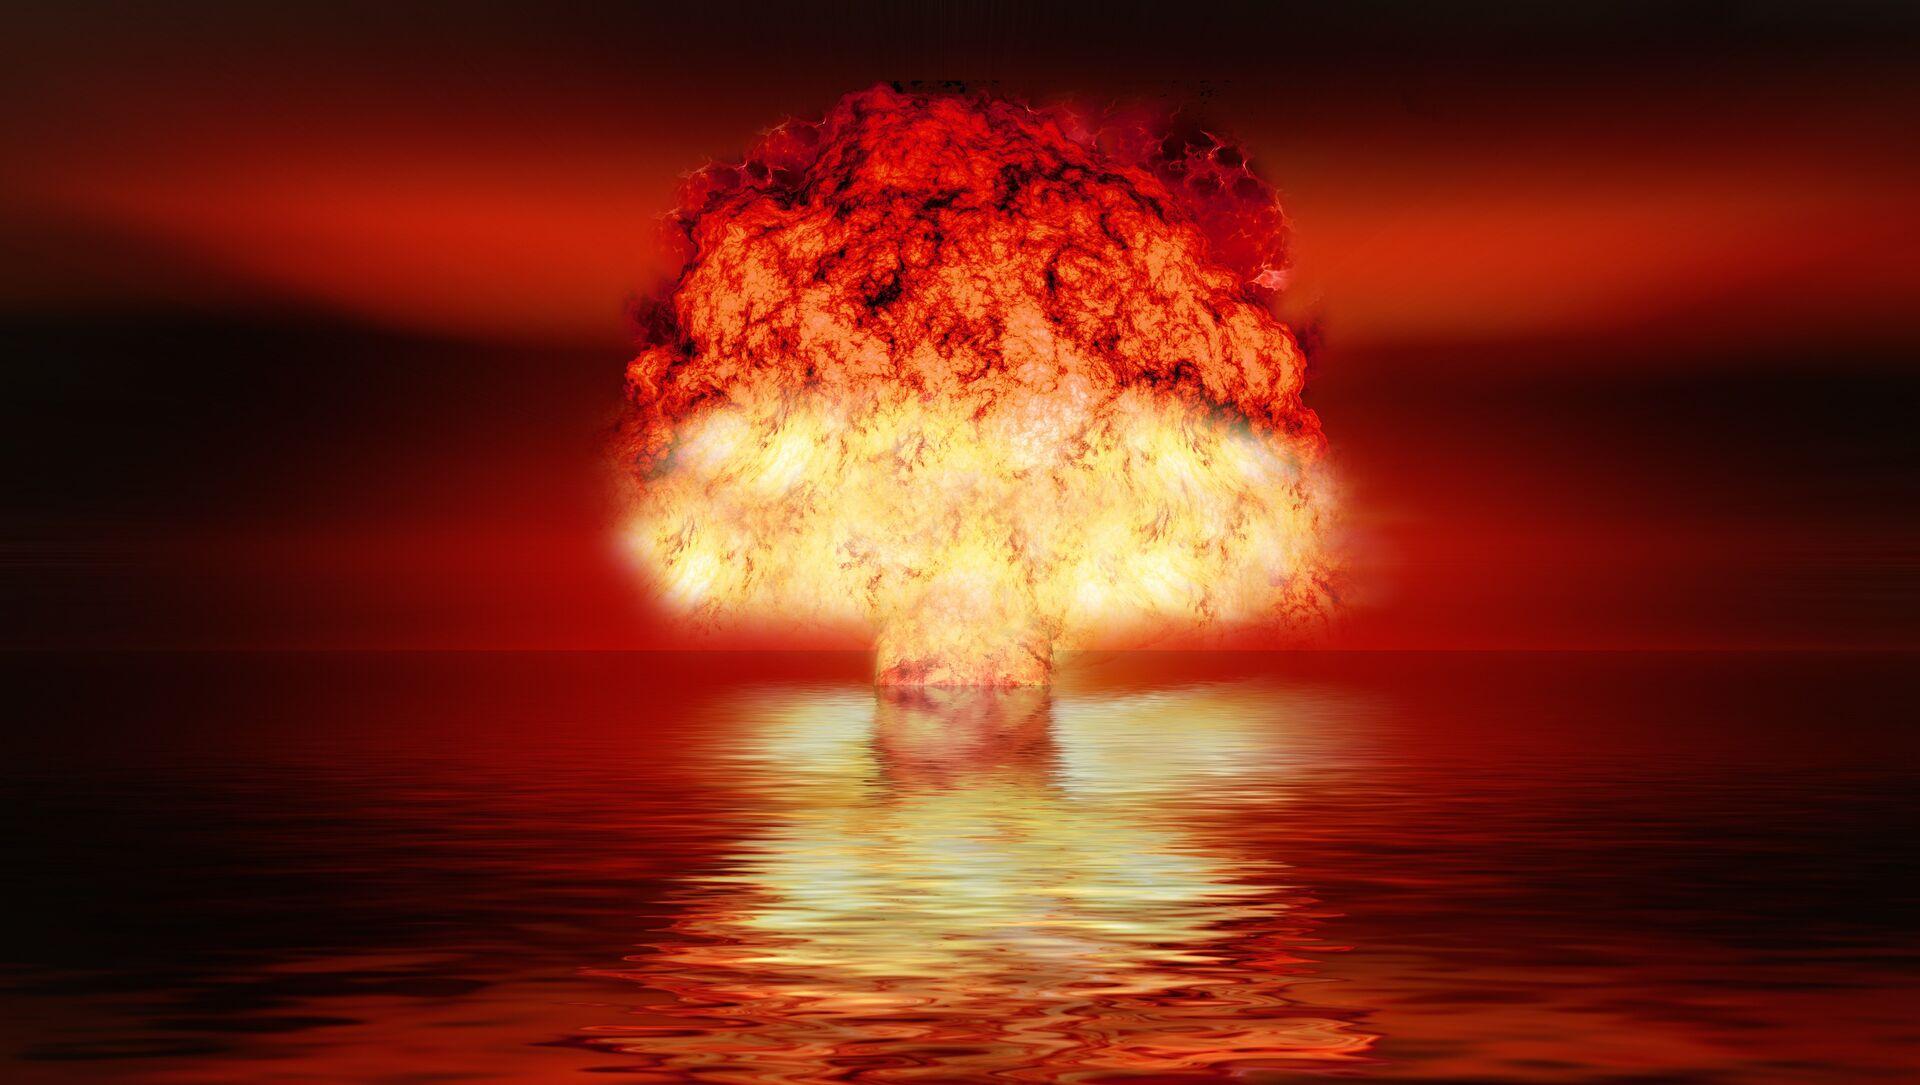 Una explosión nuclear, imagen ilustrativa - Sputnik Mundo, 1920, 03.02.2021